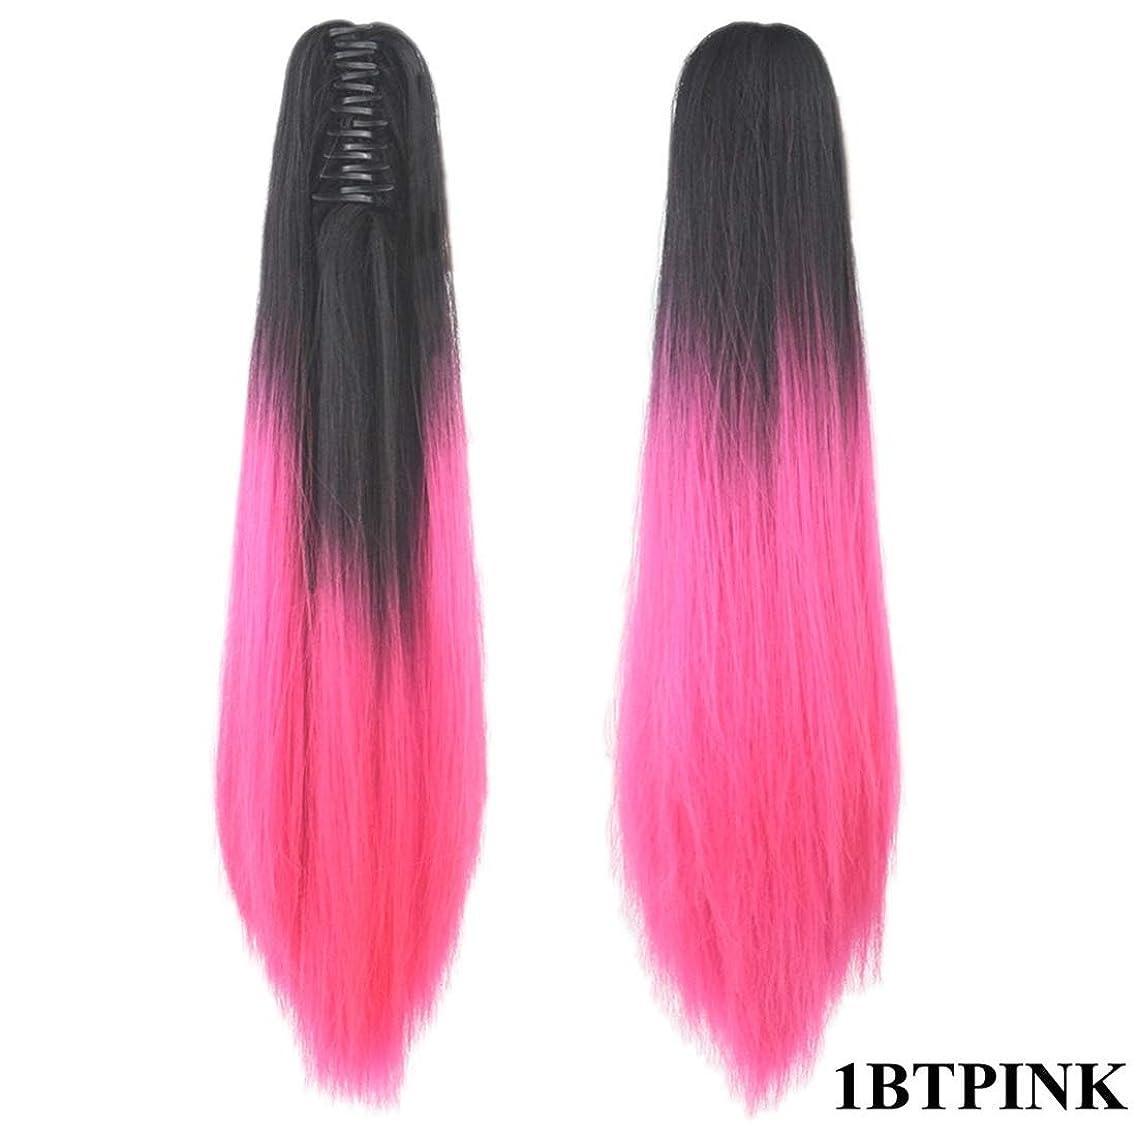 BOBIDYEE ポニーテールクリップグラデーションロングストレートヘアウィッグポニーテールウィッグ女性のための合成髪レースかつらロールプレイングかつら (色 : 1TPINK)